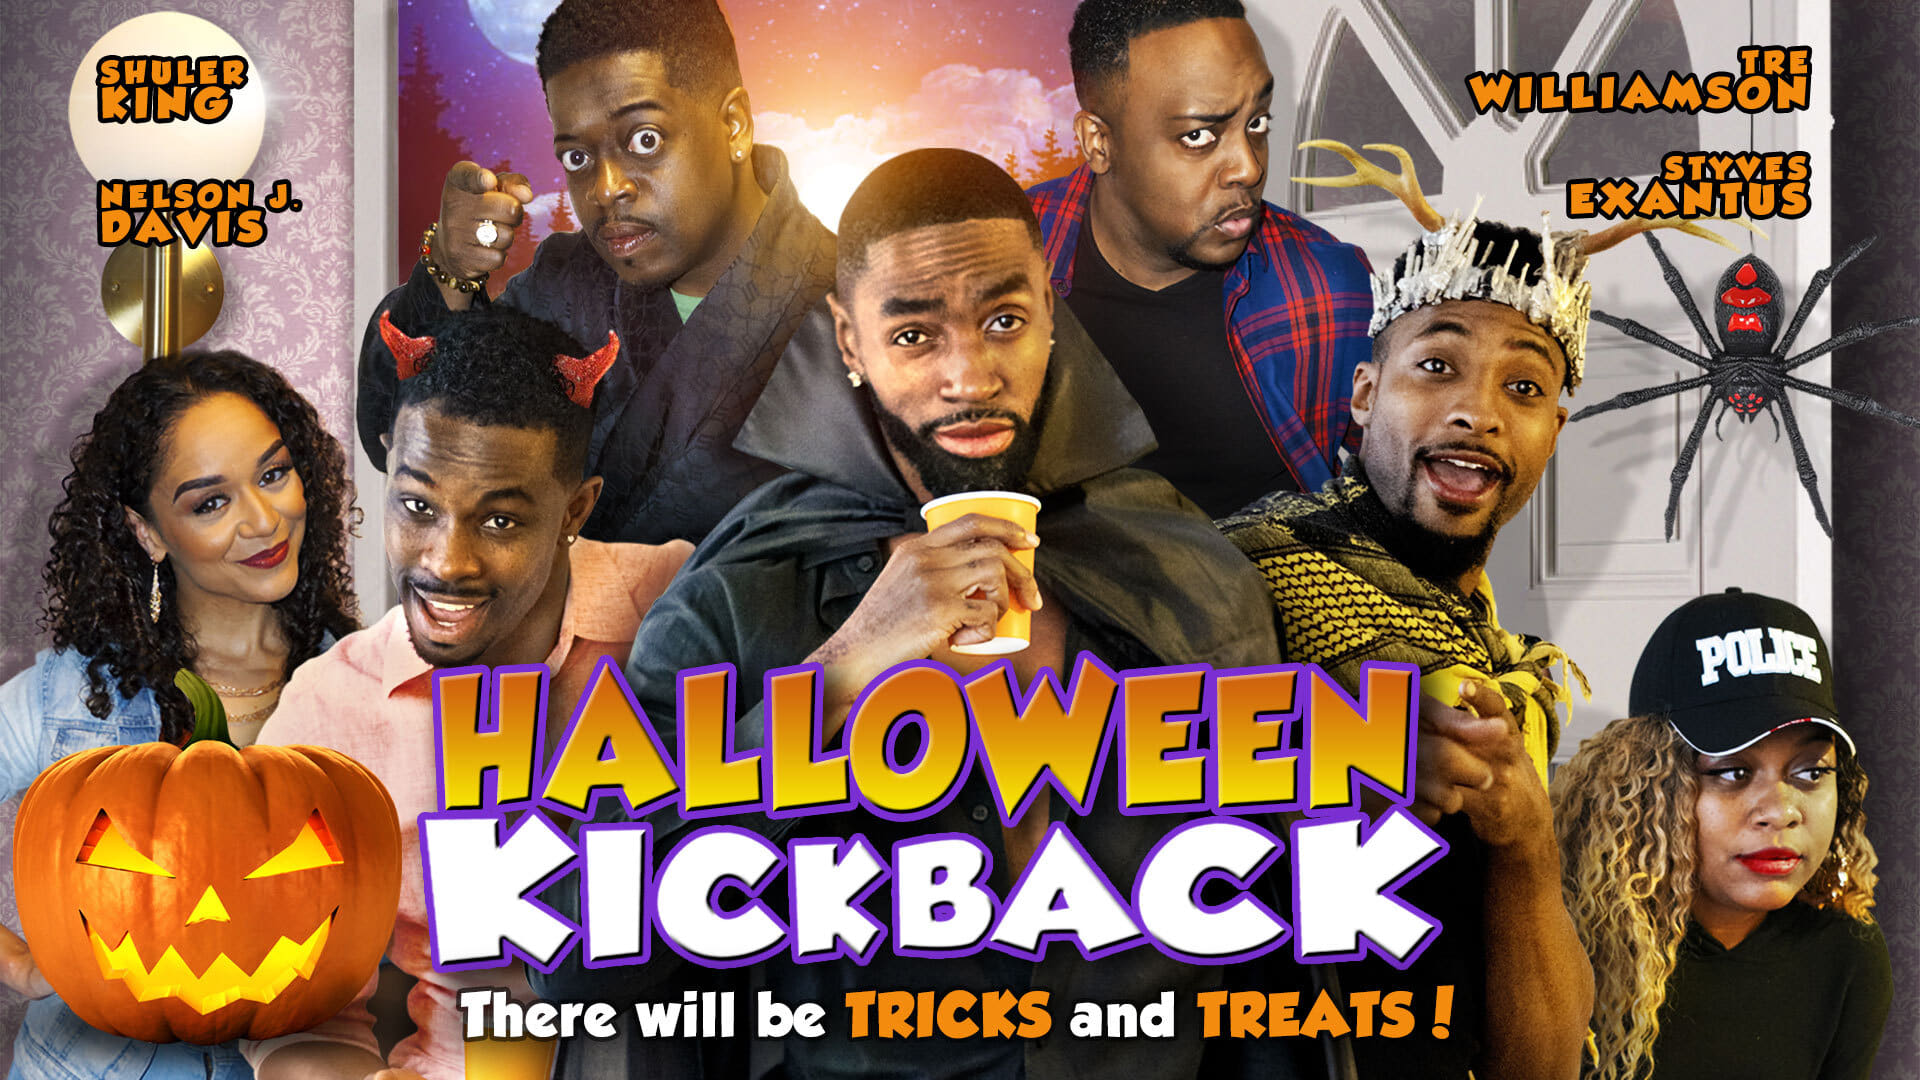 Halloween Kickback (2021) 4K Movie Online Full